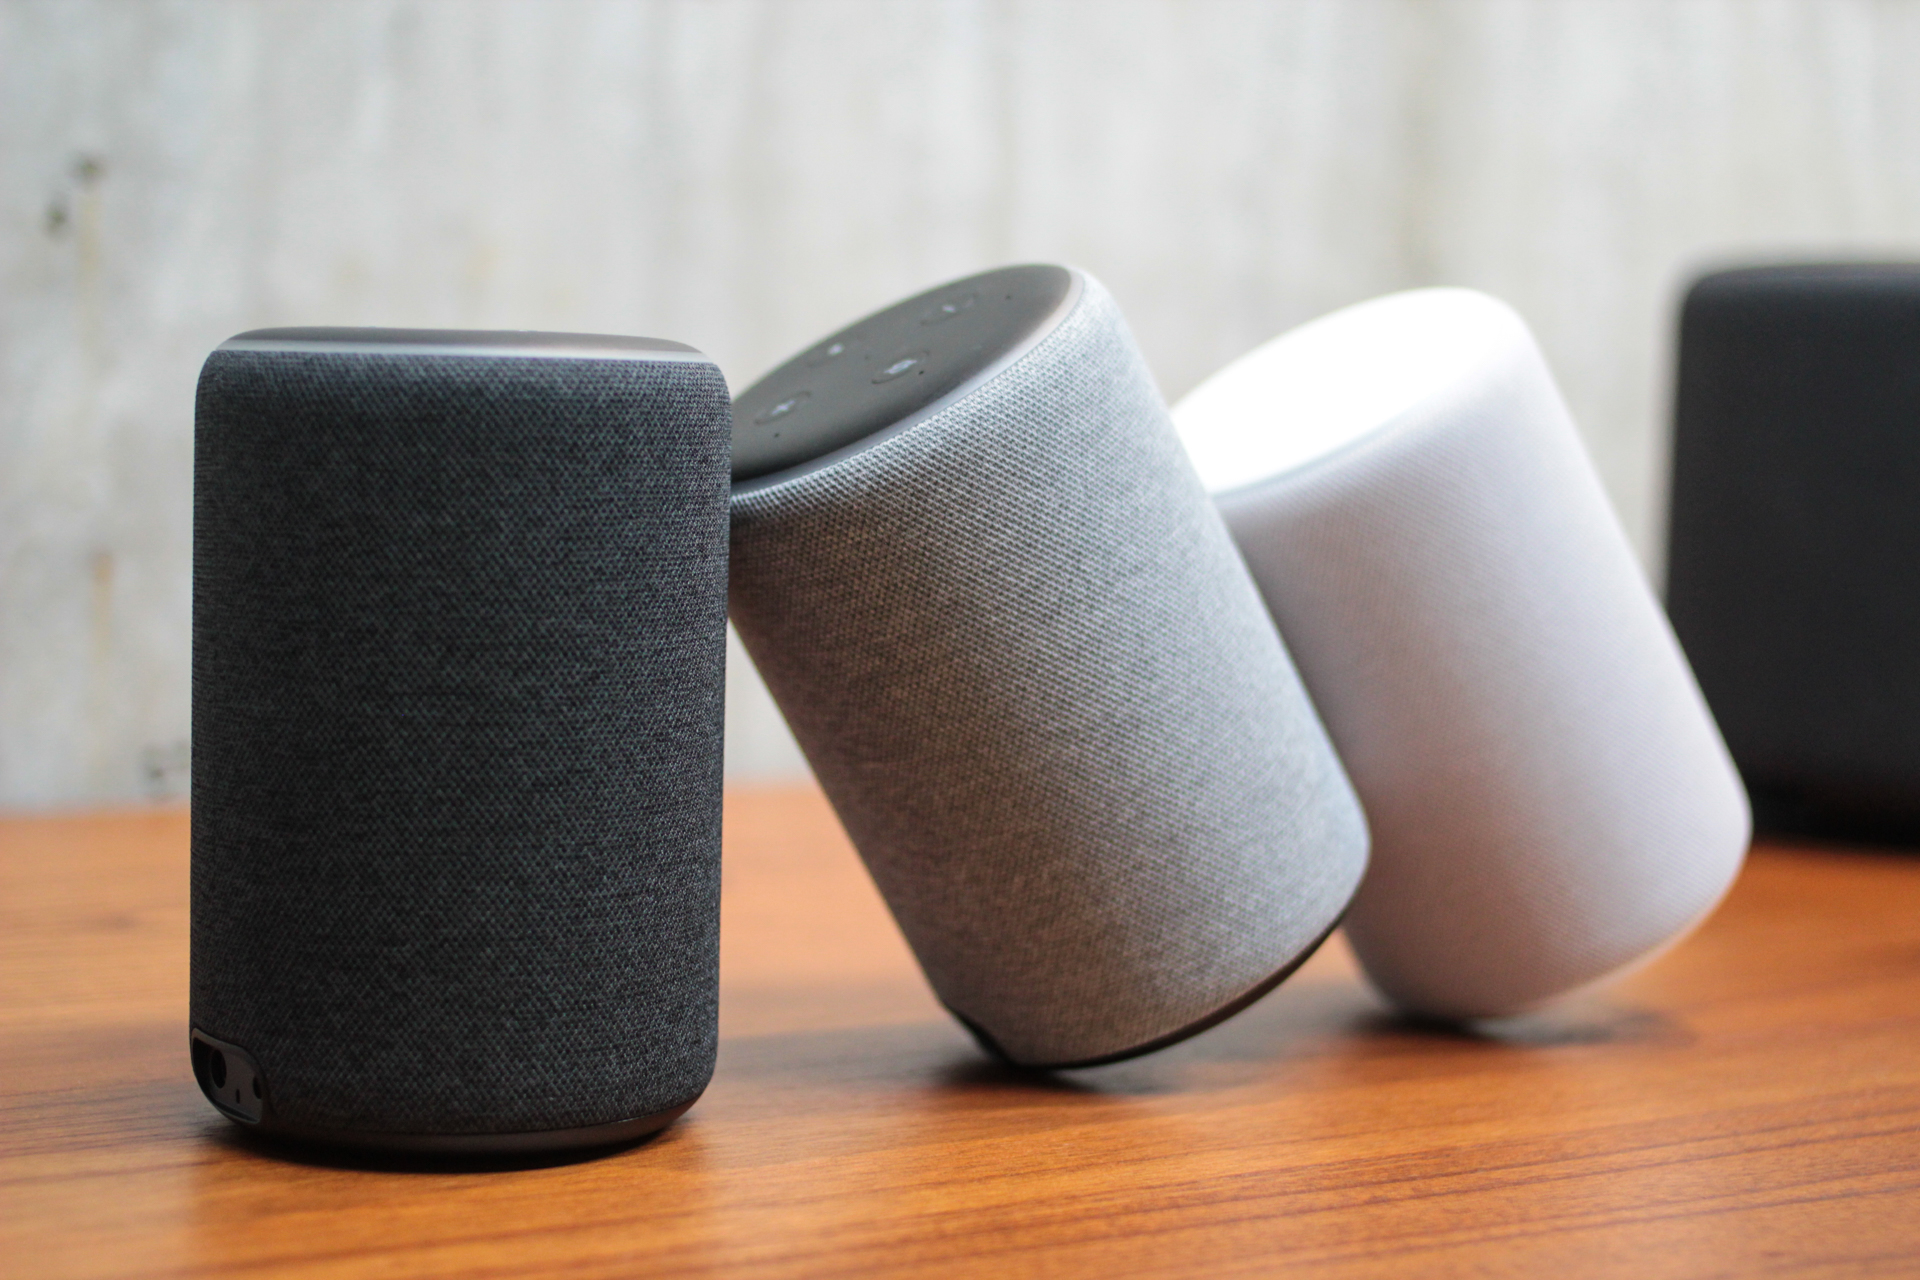 techcrunch.com - Brian Heater - Amazon Echo devices can now make Skype calls